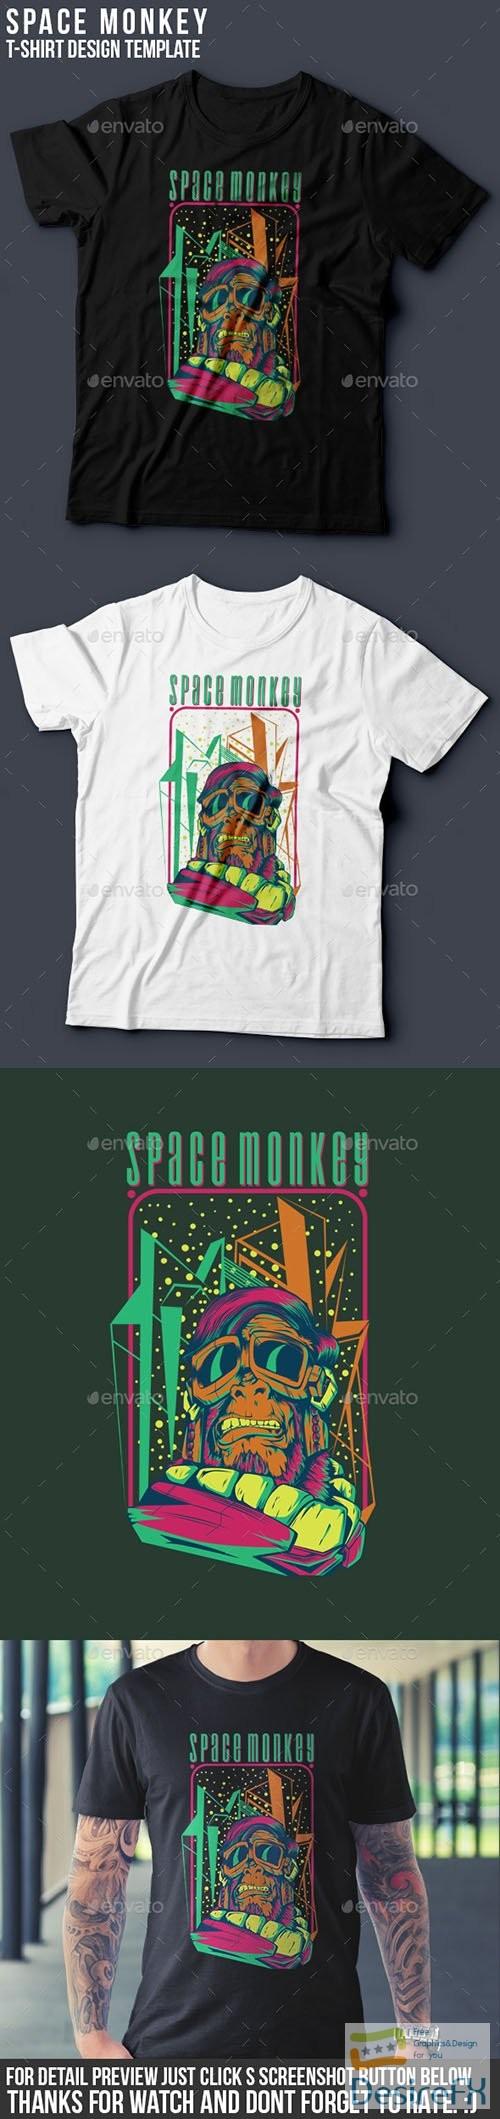 Space Monkey 8854688